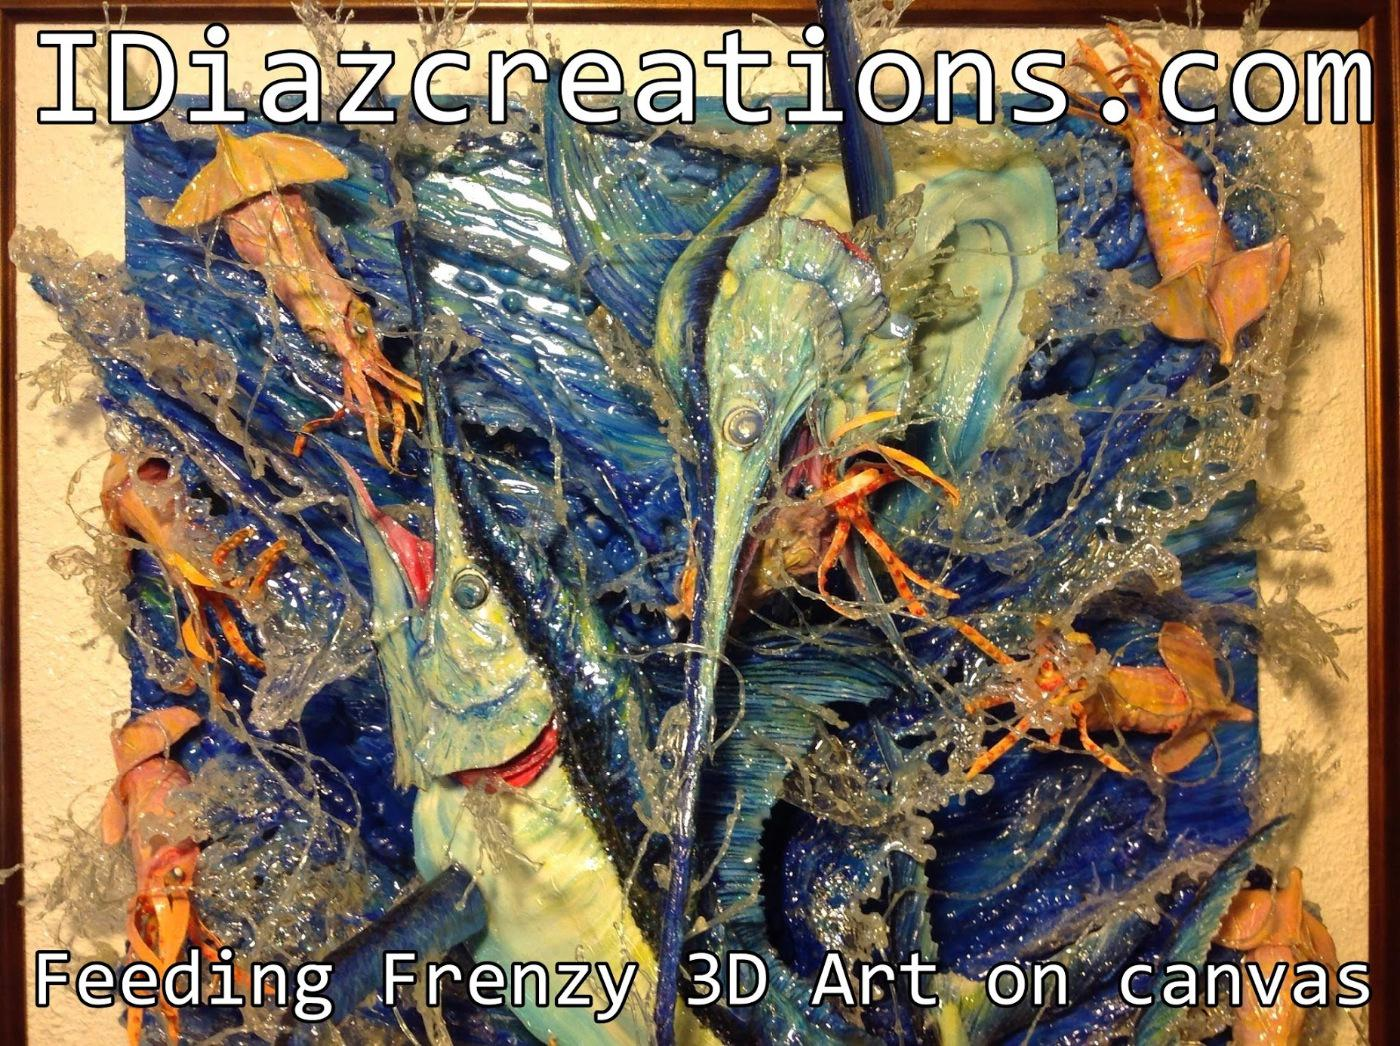 @HEATNATlON @Marlins @idiazcreations #LetsGoFish #MarlinNation http://t.co/BcSMAJamRv